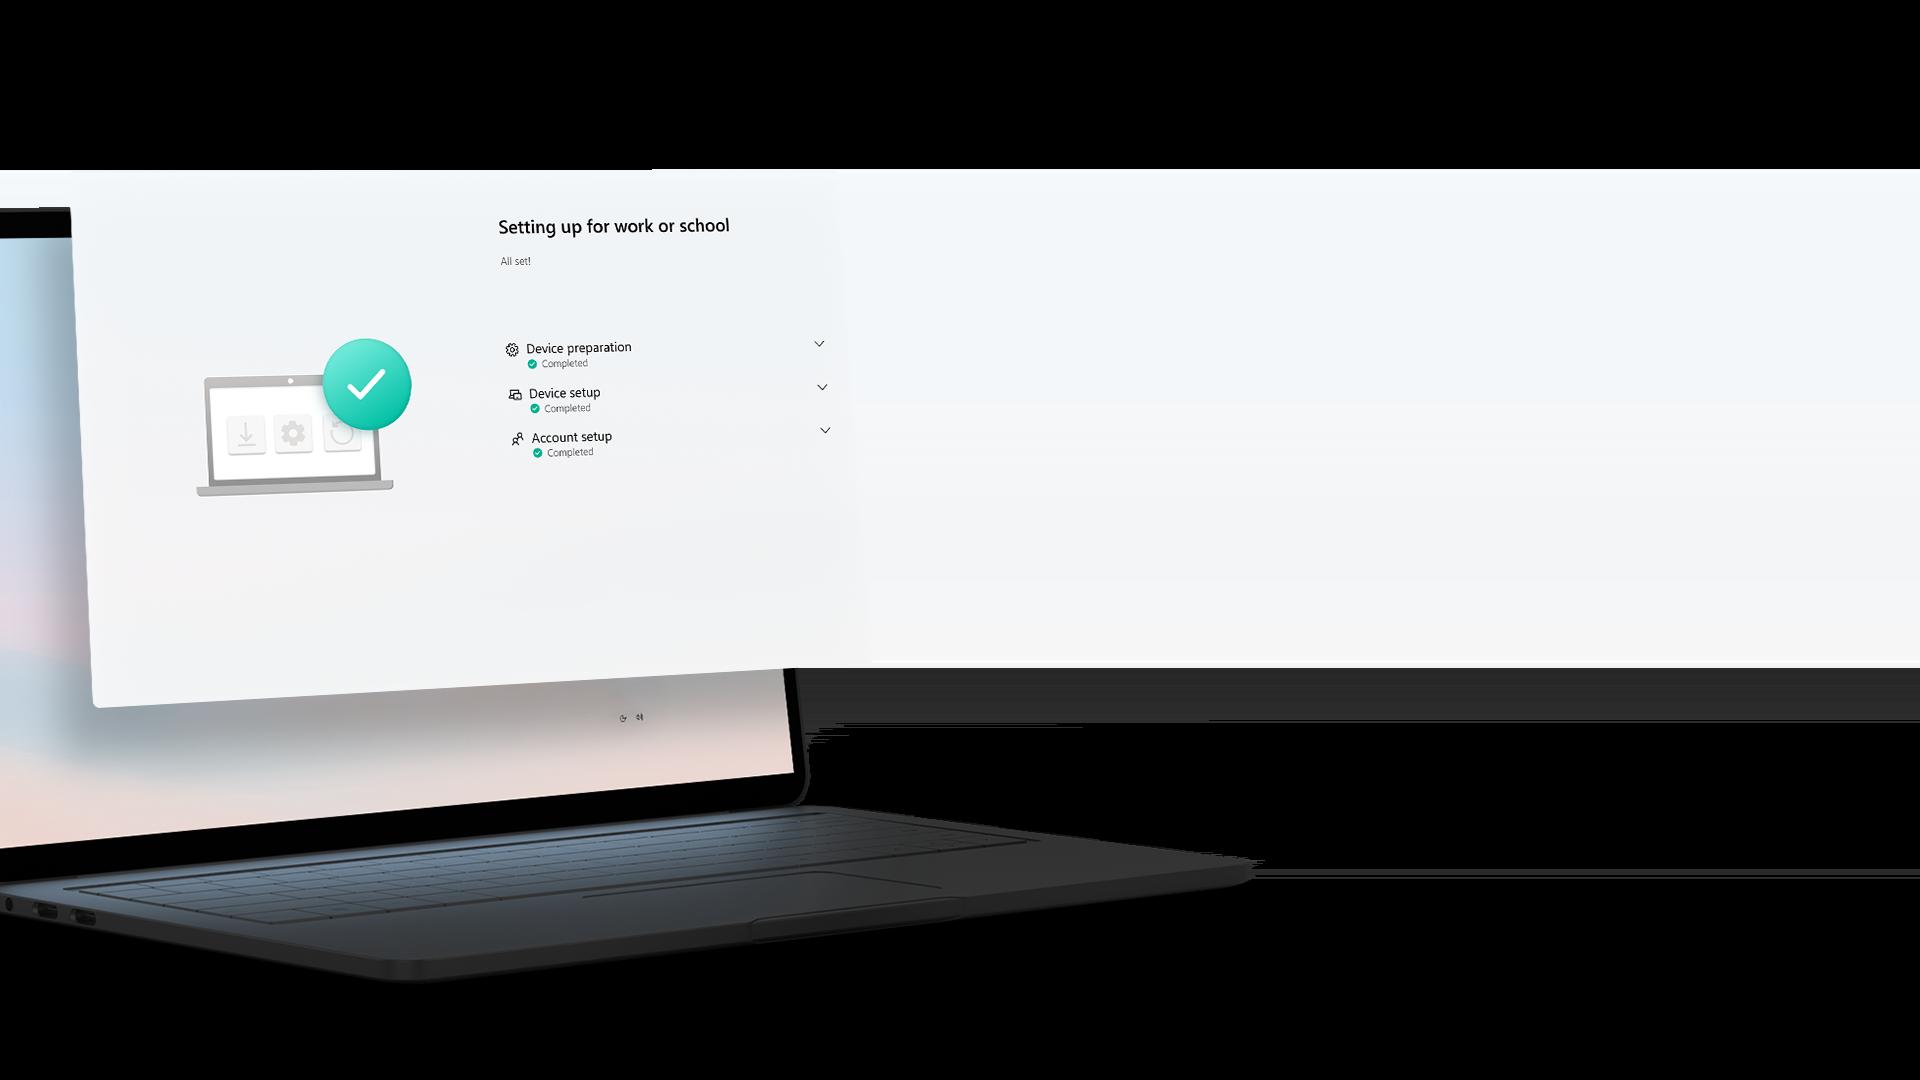 Windows 11 same application compatibility screen on a Windows device